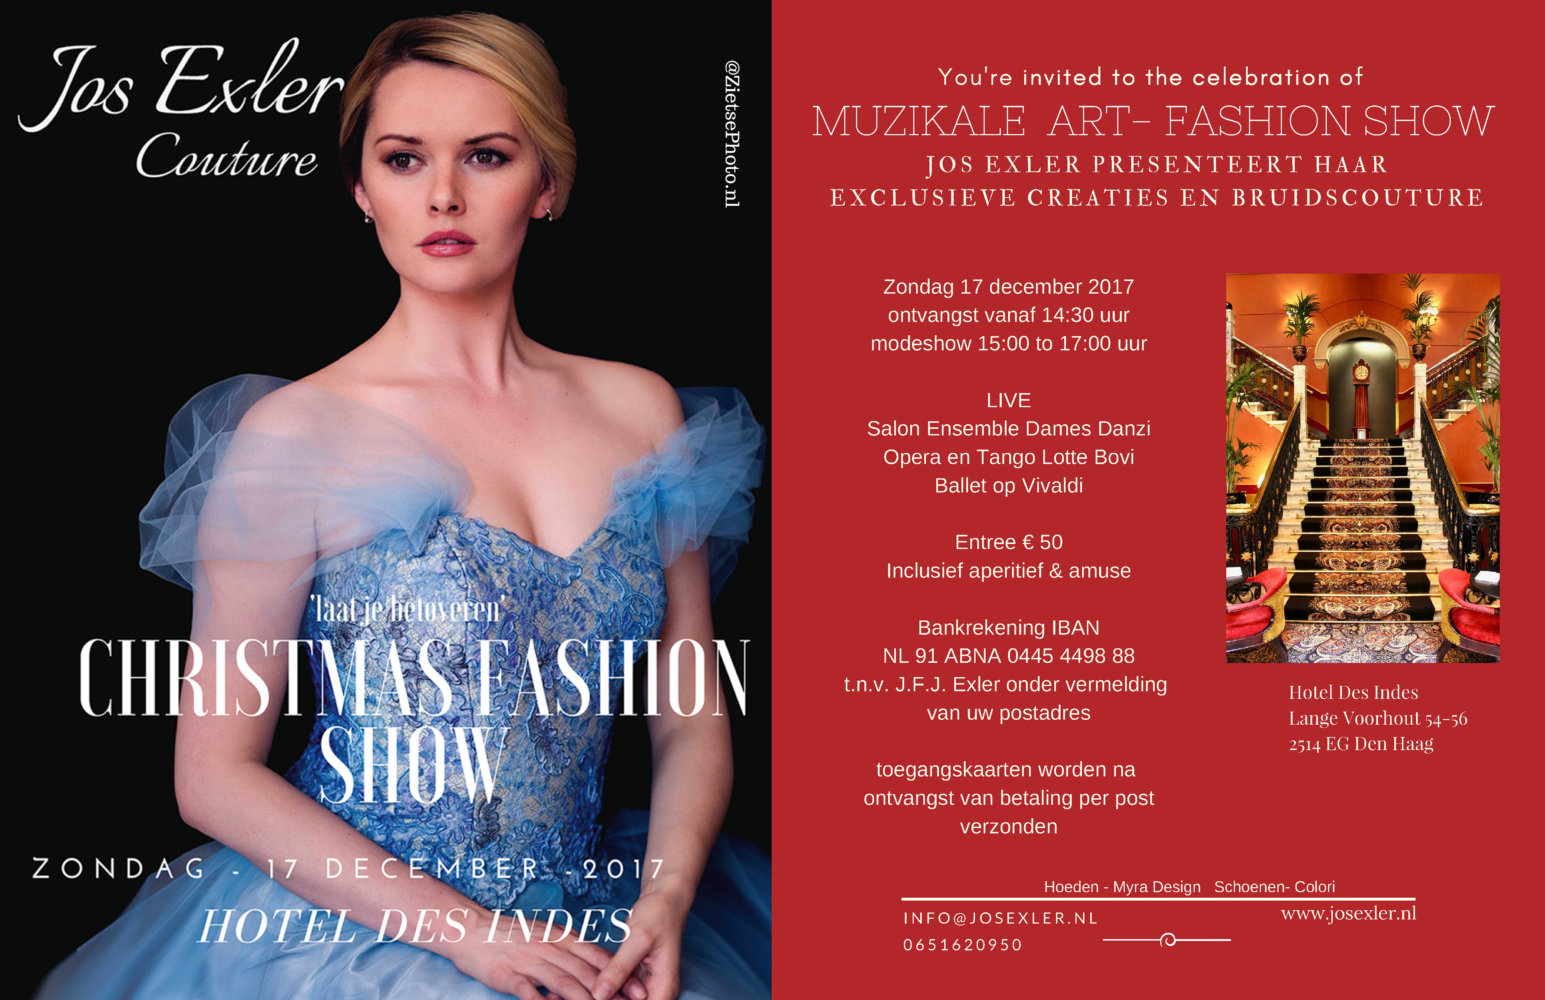 Jos Exler Uitnodiging Christmas fashionshow 17 december